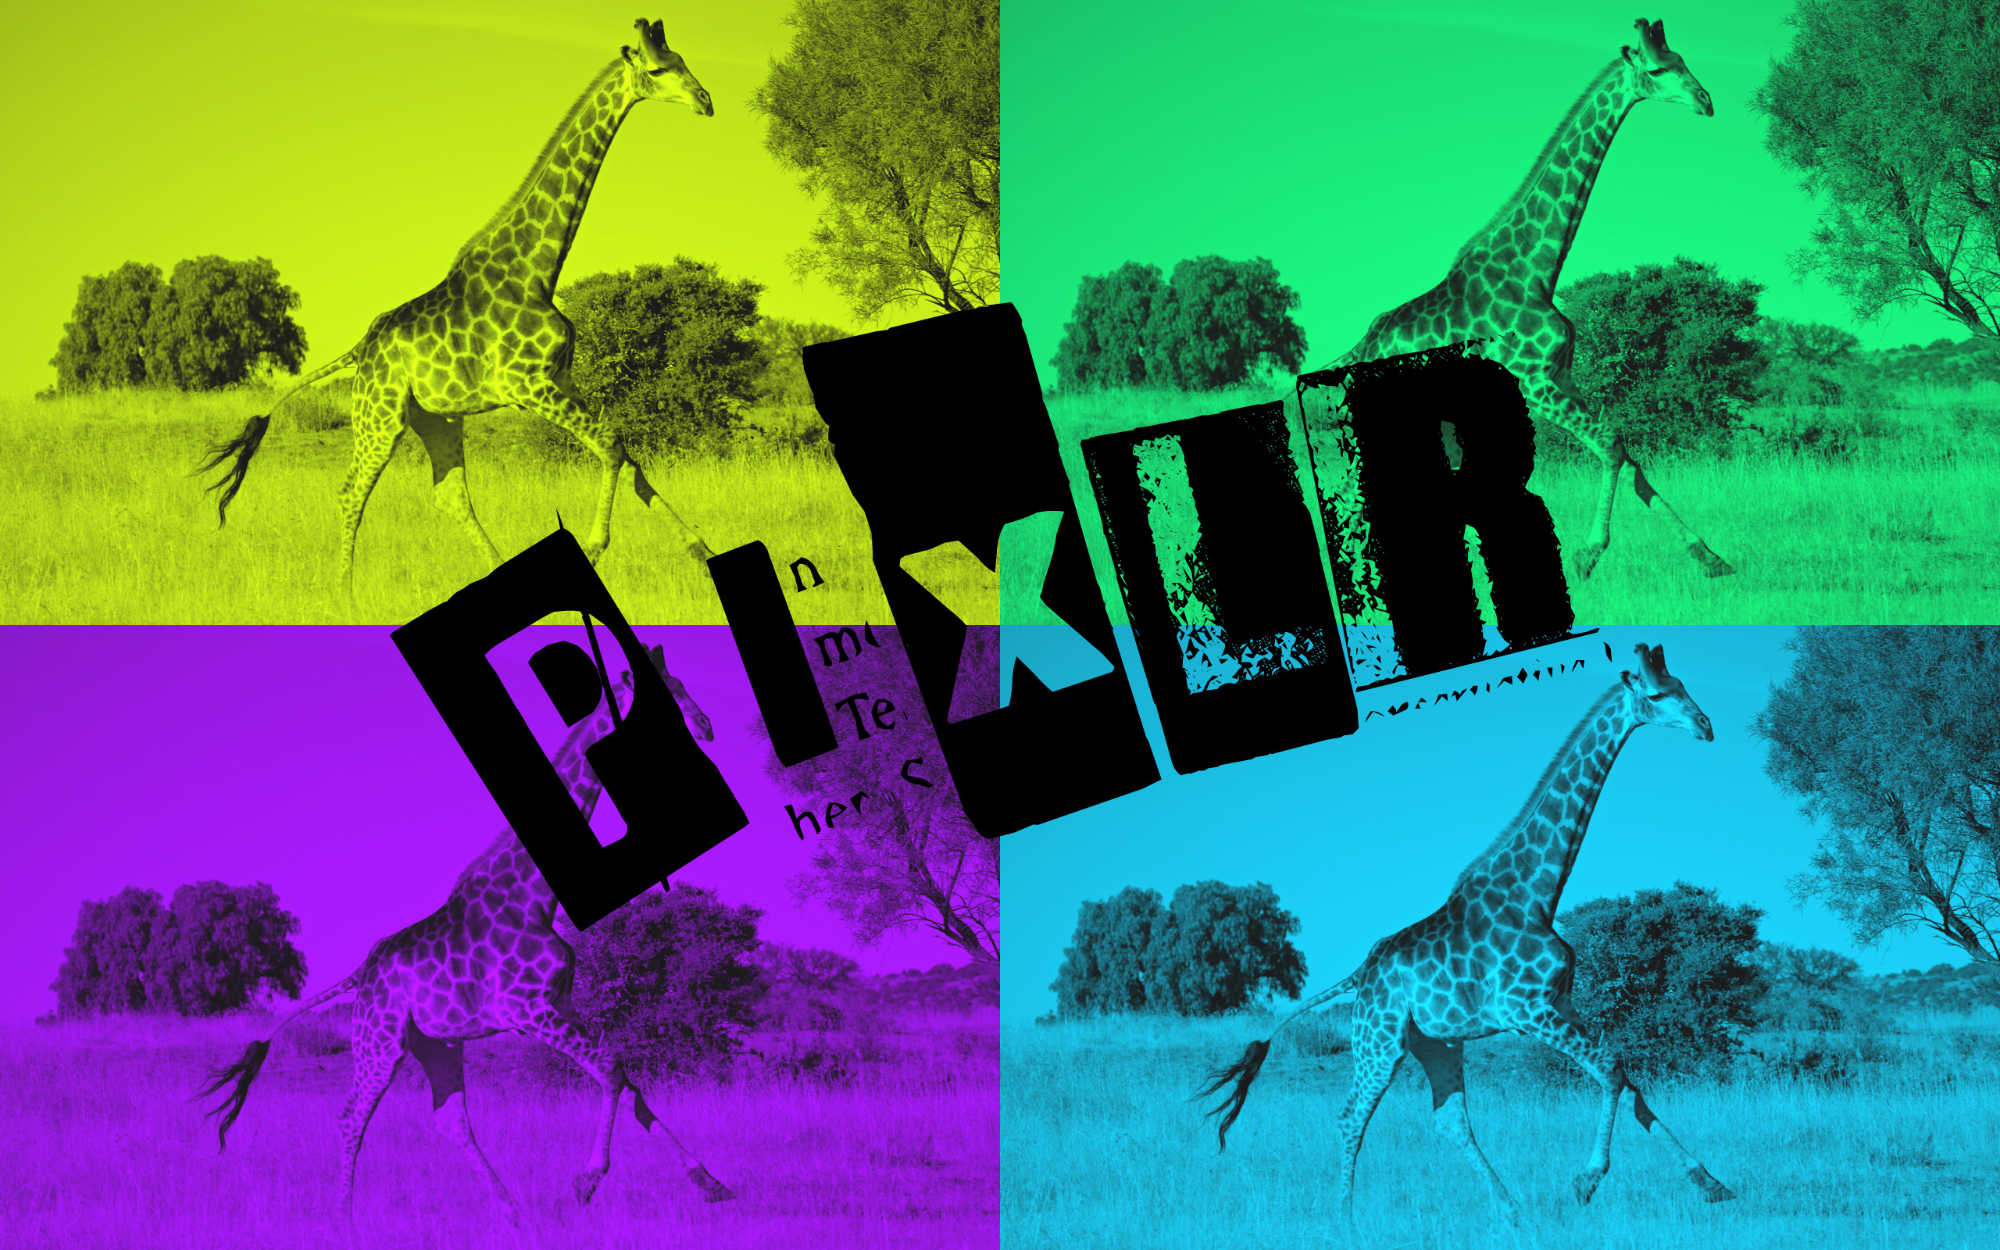 PIXLR imagem editor online